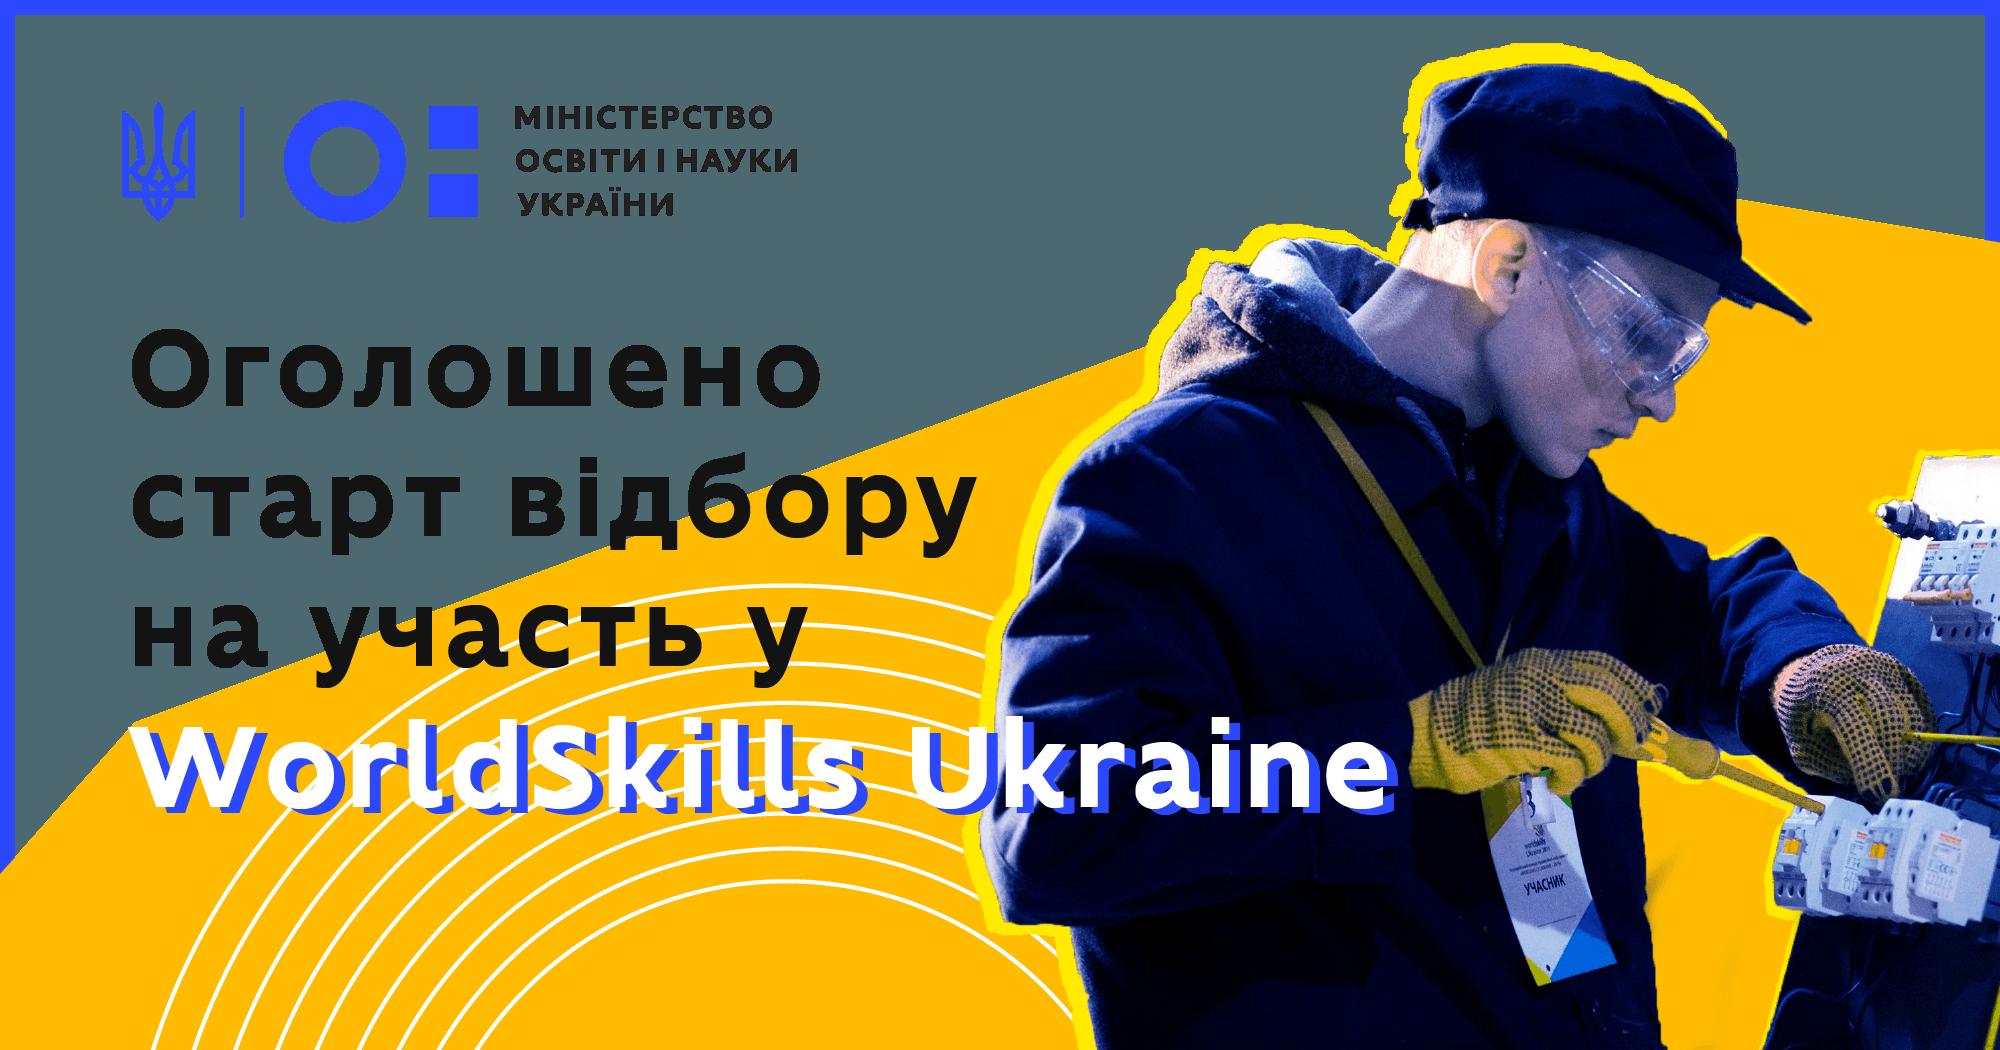 МОН оголосило перший етап Всеукраїнського конкурсу WorldSkills Ukraine